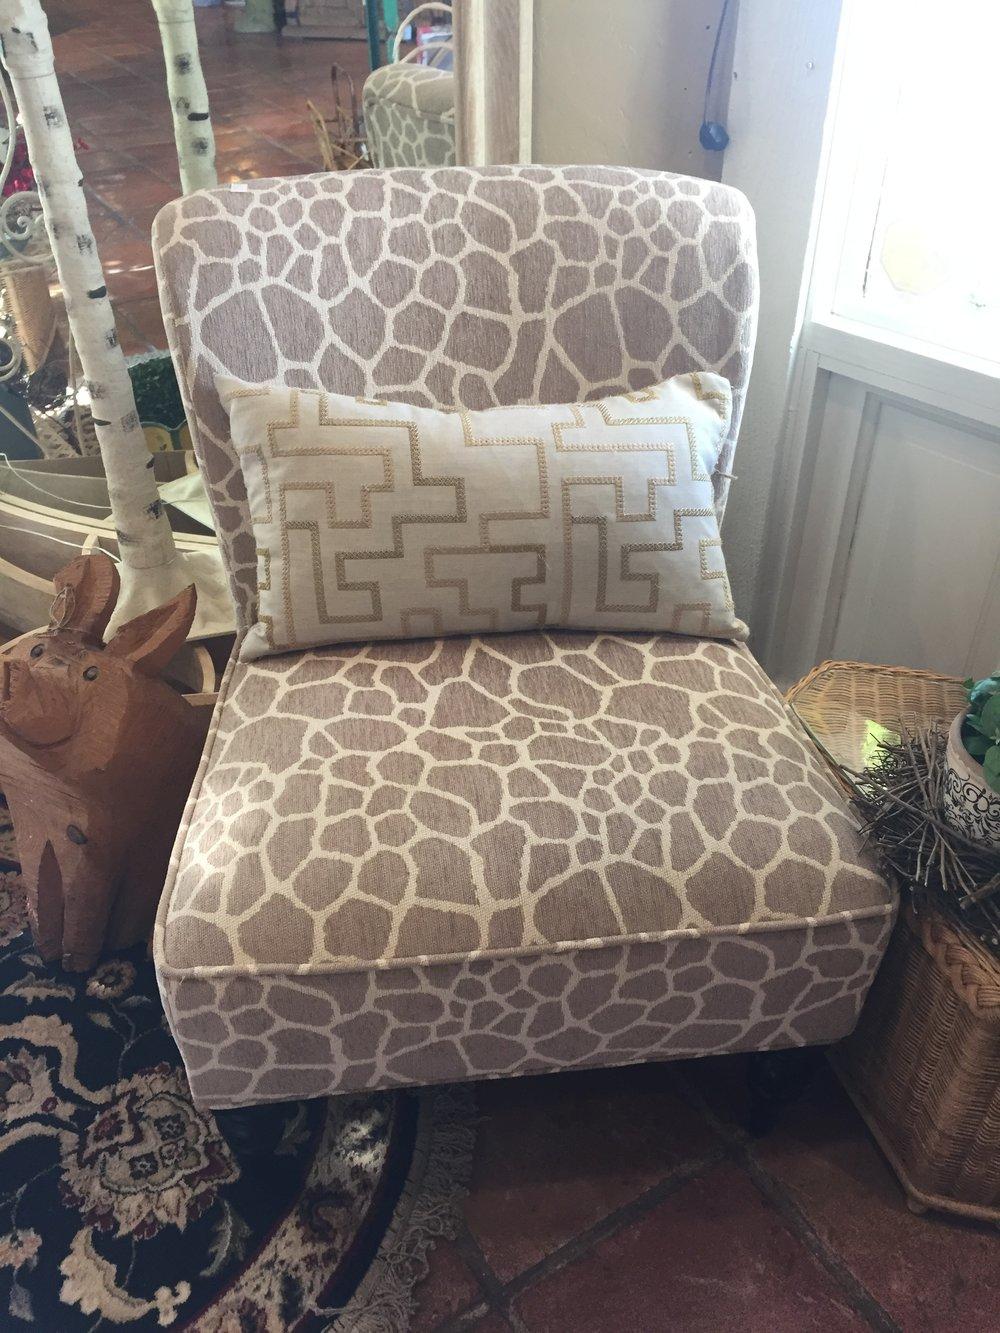 Giraffe Print Accent Chair $229.95 - C1044 21788